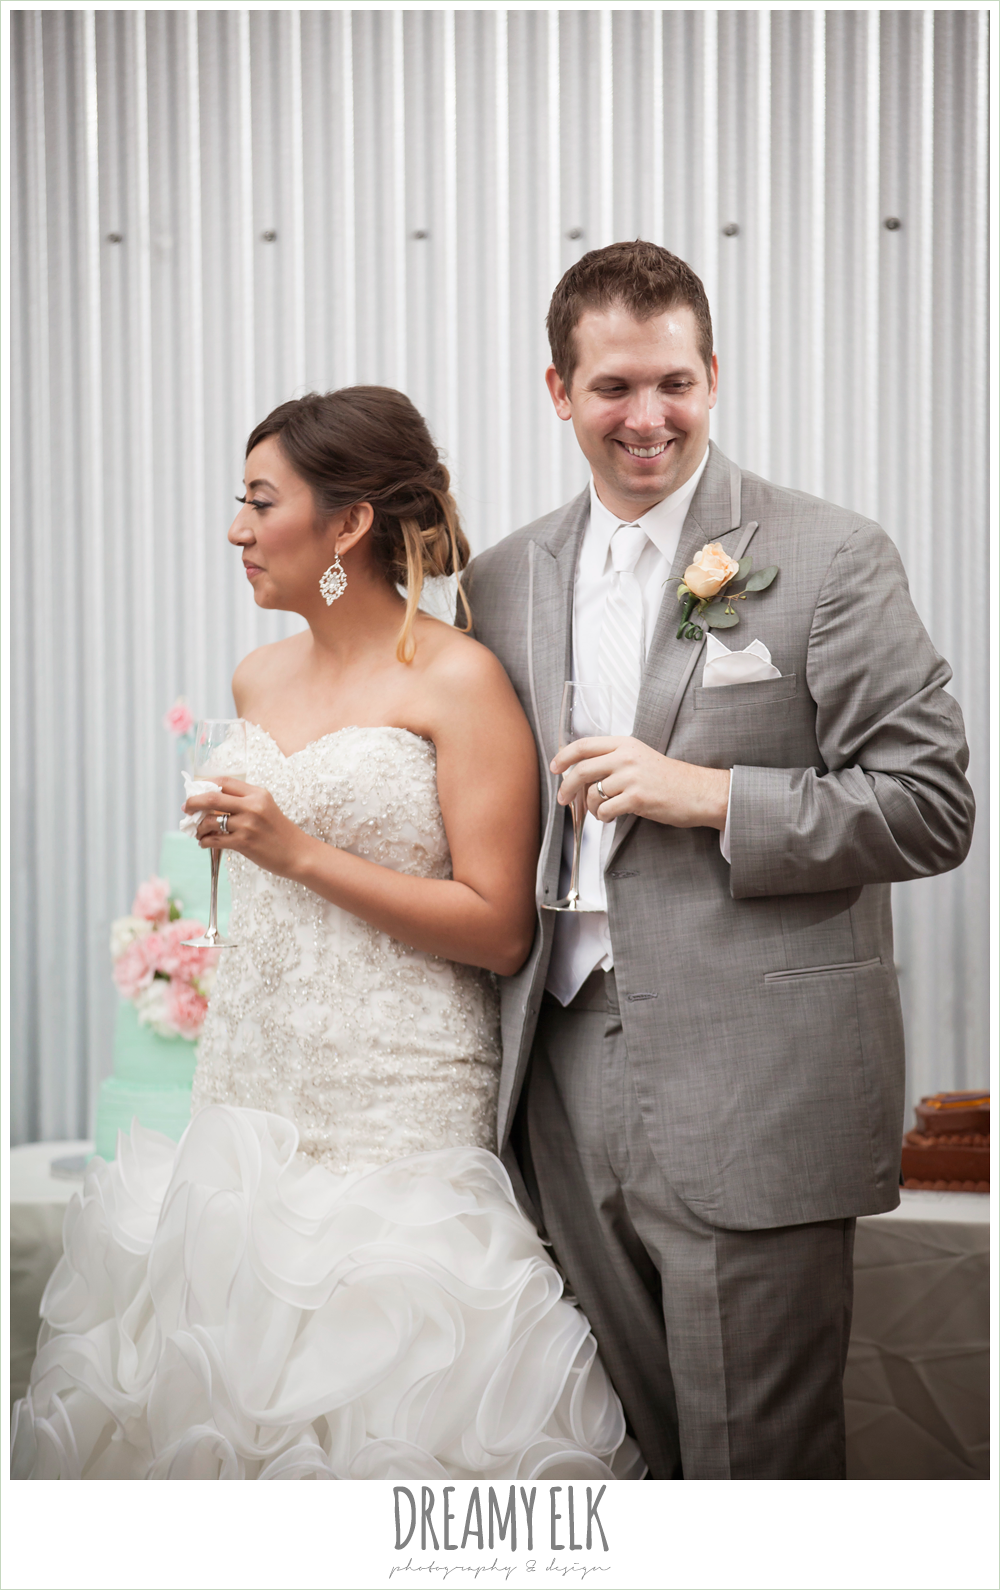 sweetheart strapless beaded wedding dress, groom in gray suit, terradorna wedding venue, austin spring wedding {dreamy elk photography and design}